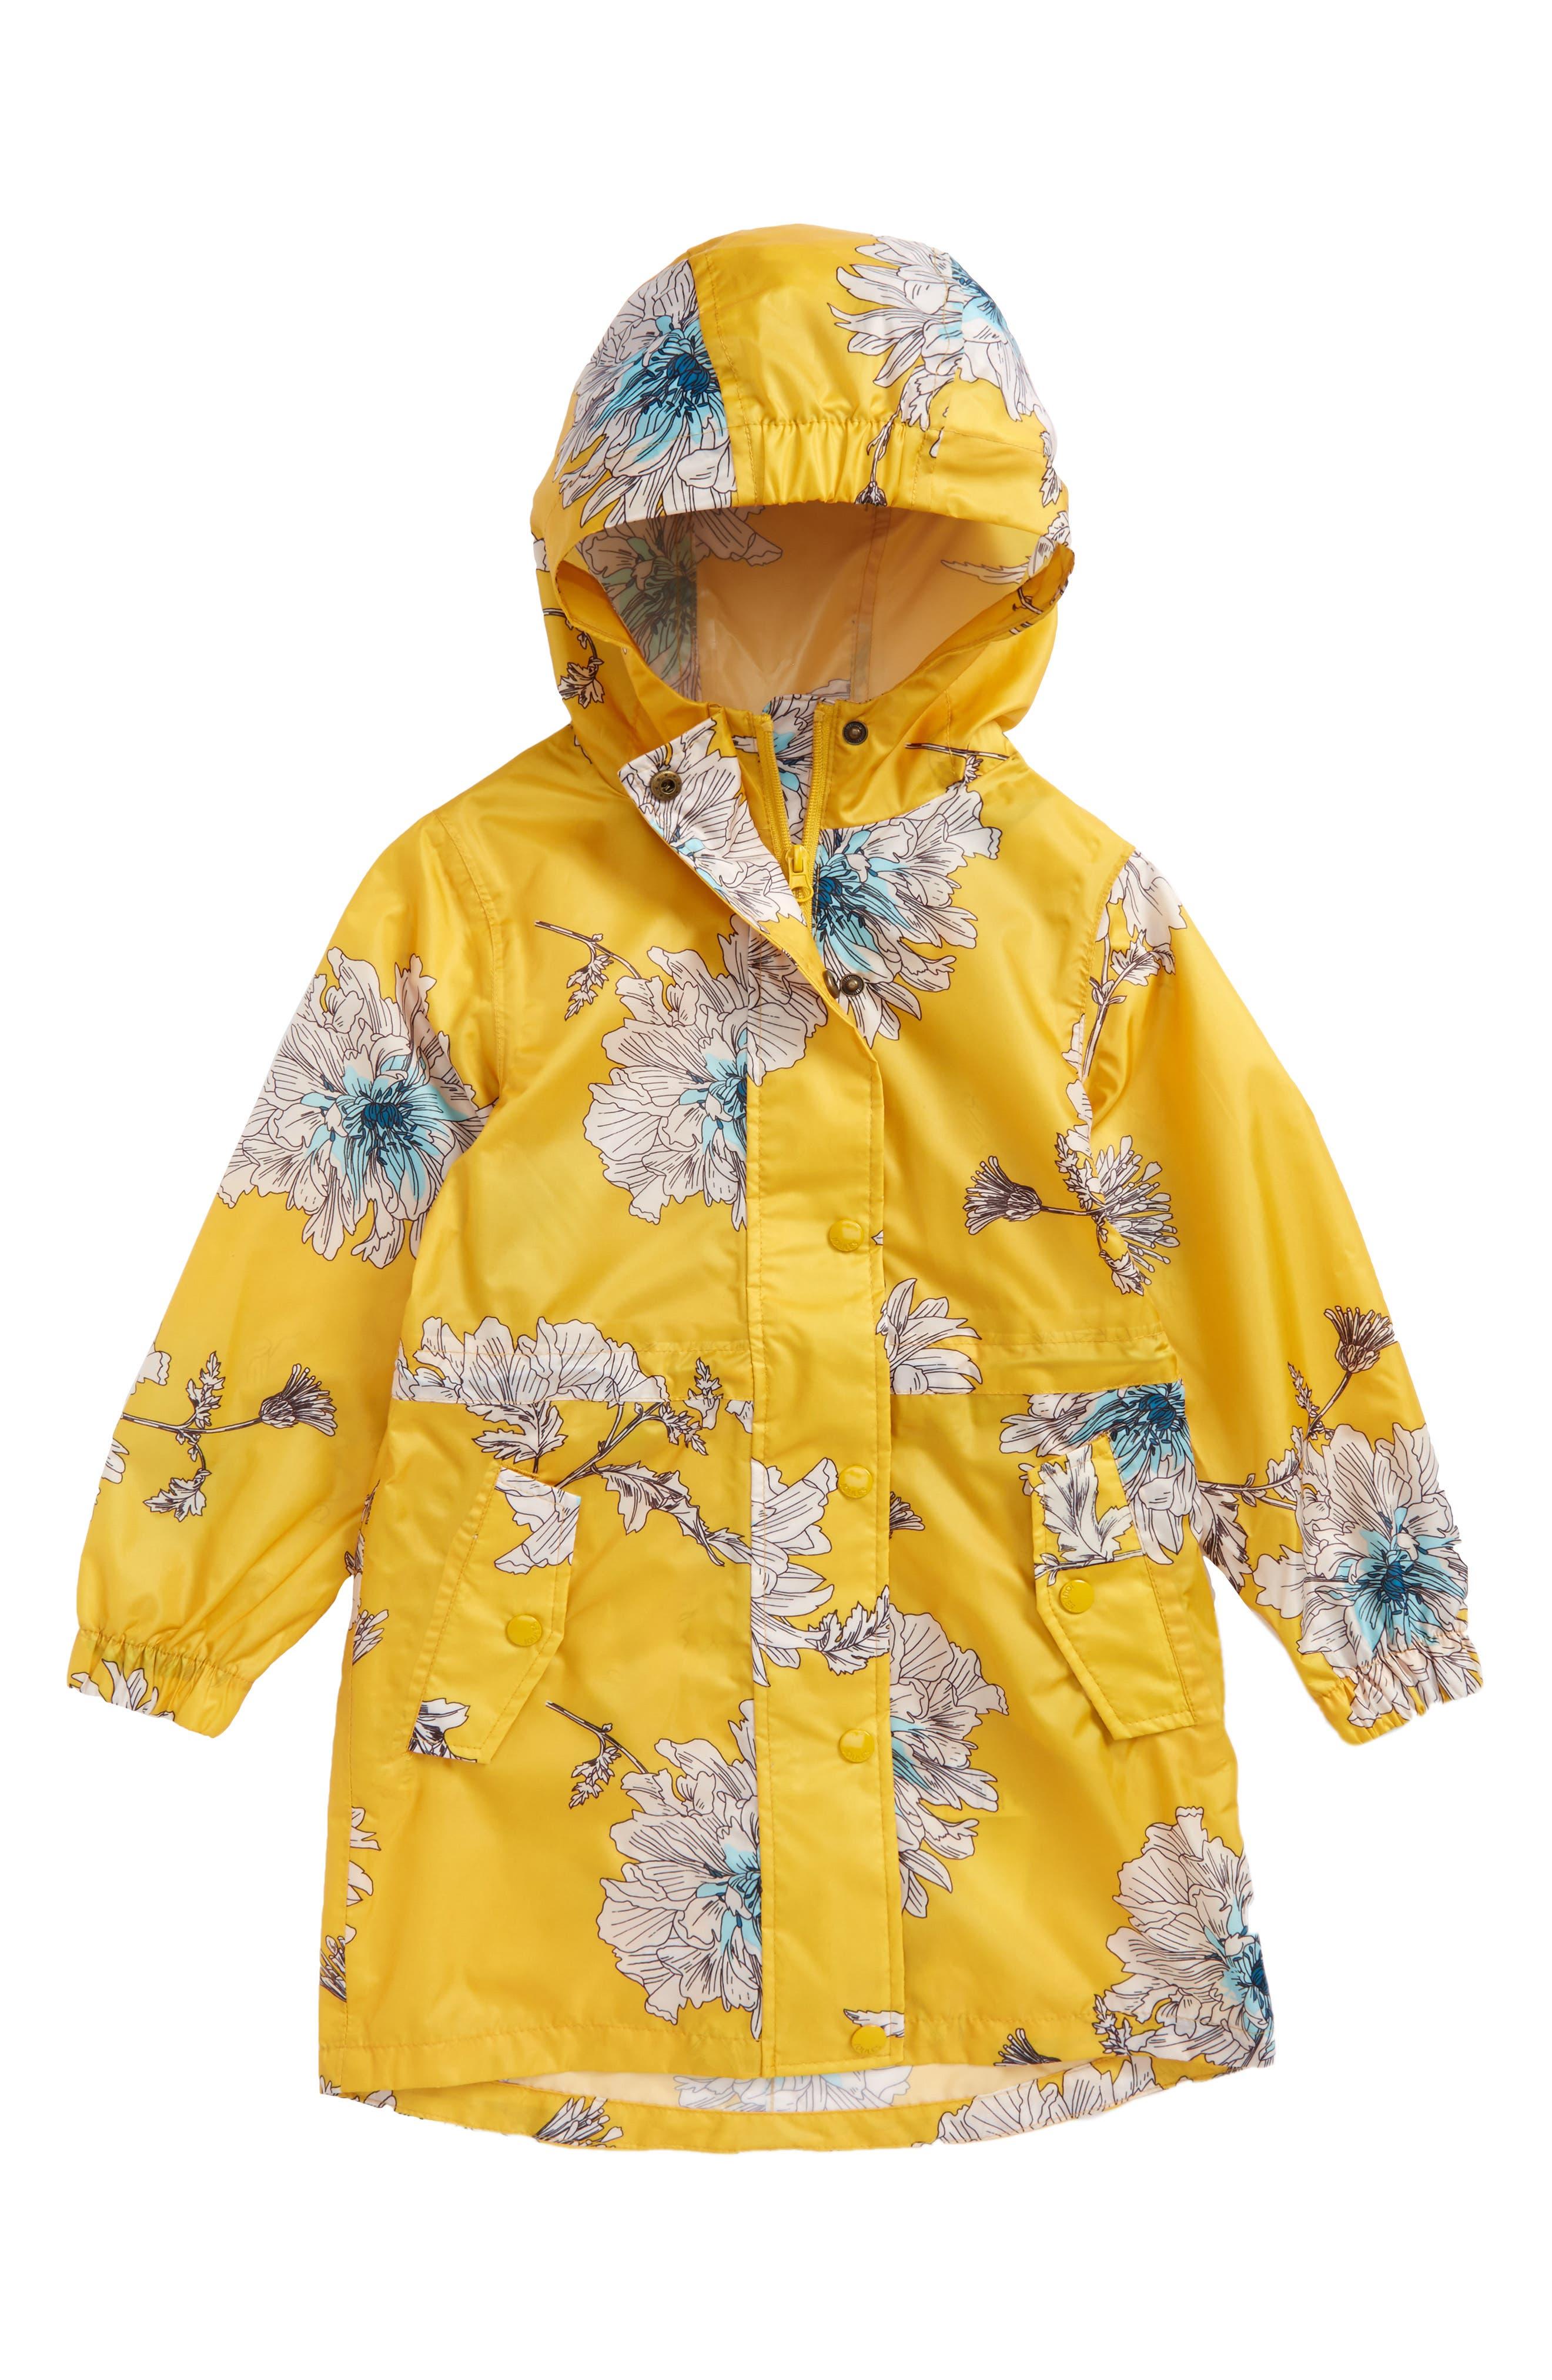 Packaway Flower Print Rain Jacket,                         Main,                         color, Antique Gold Peony